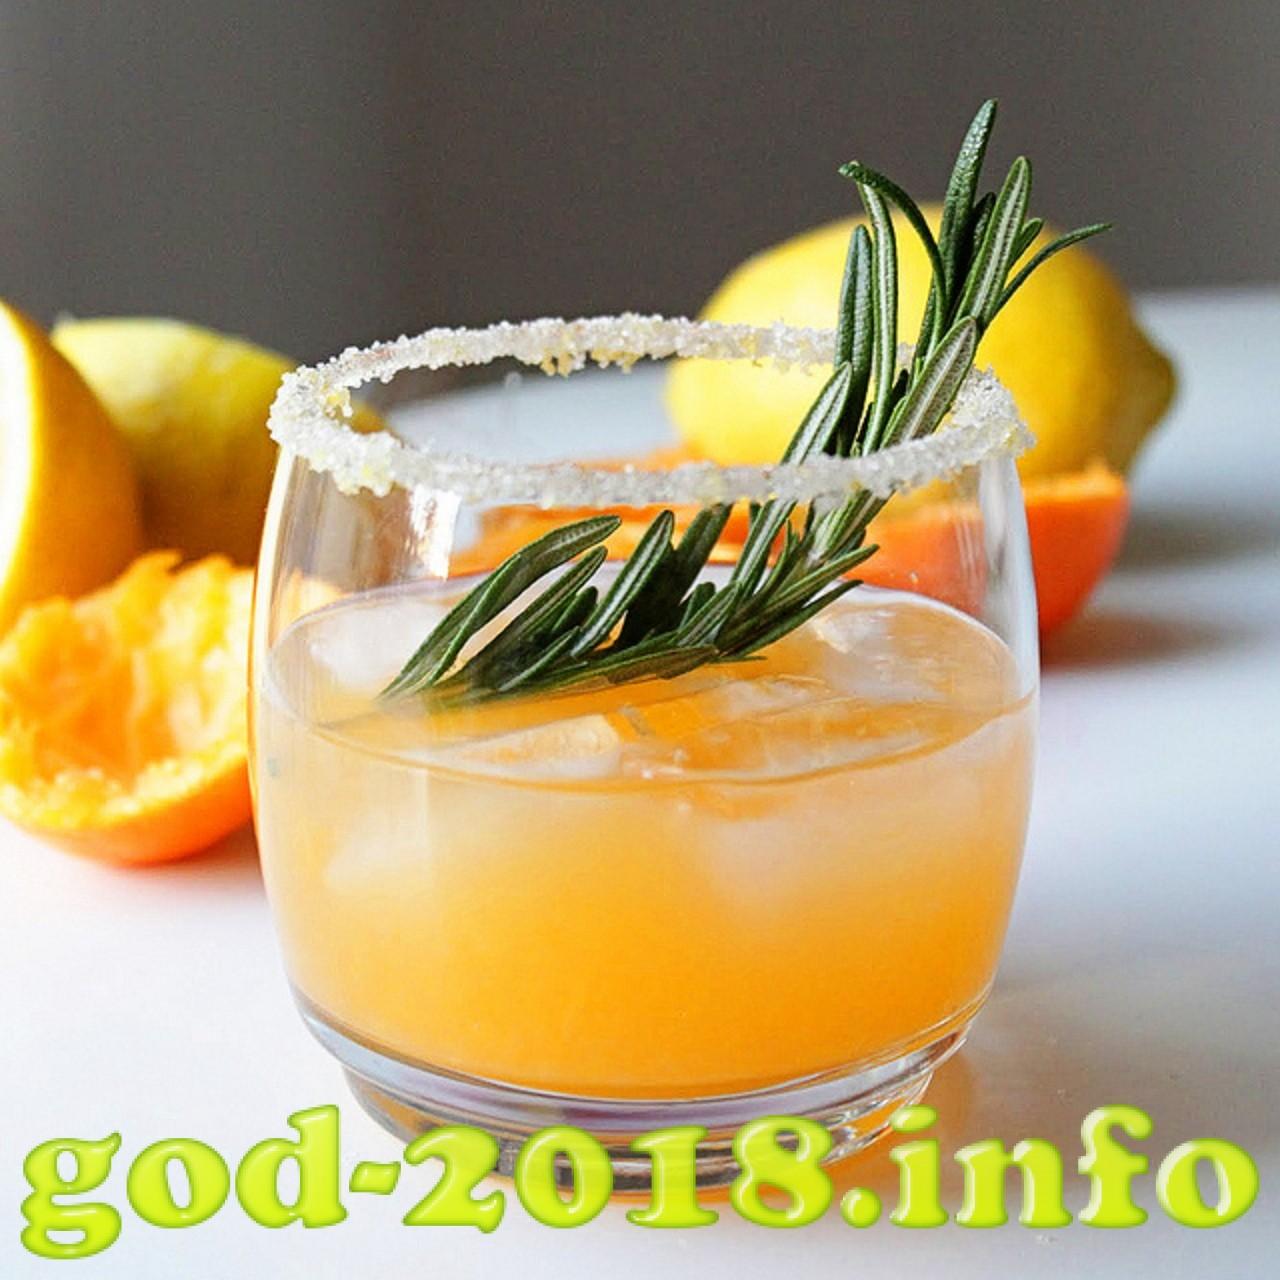 chto-pit-na-novyj-god-2018-sobaki-recepty-koktejlej-2